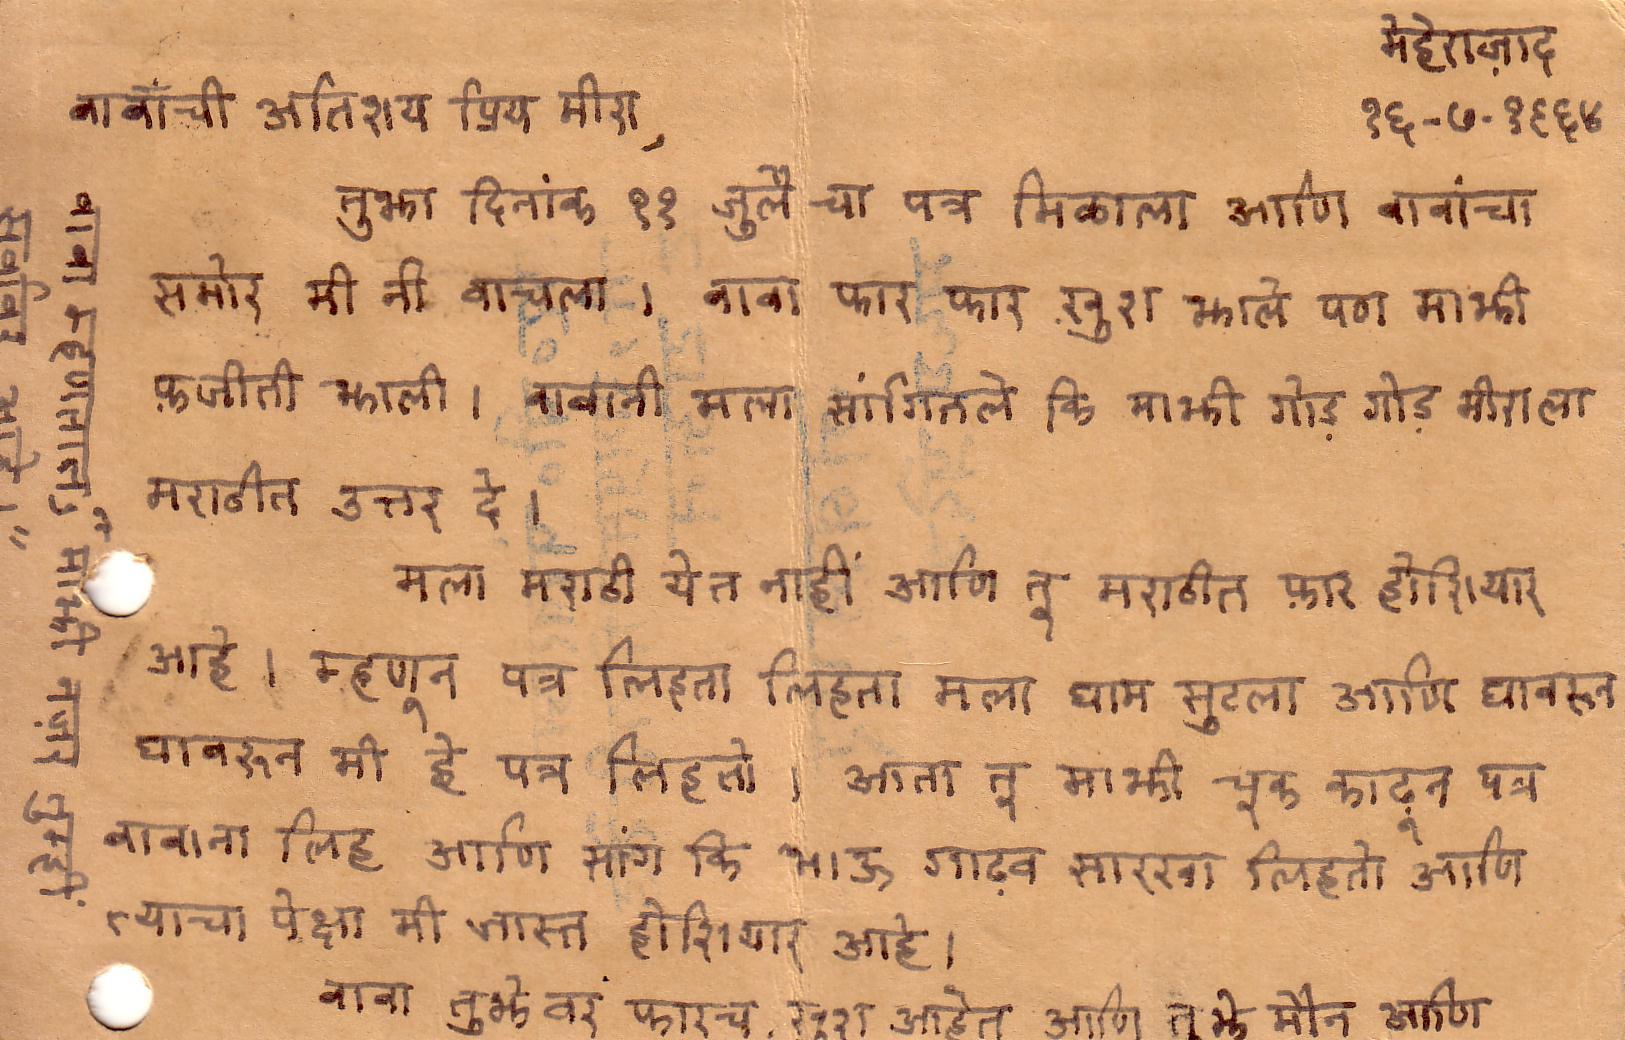 Meher Babas letters to Meera Kale Pankhraj